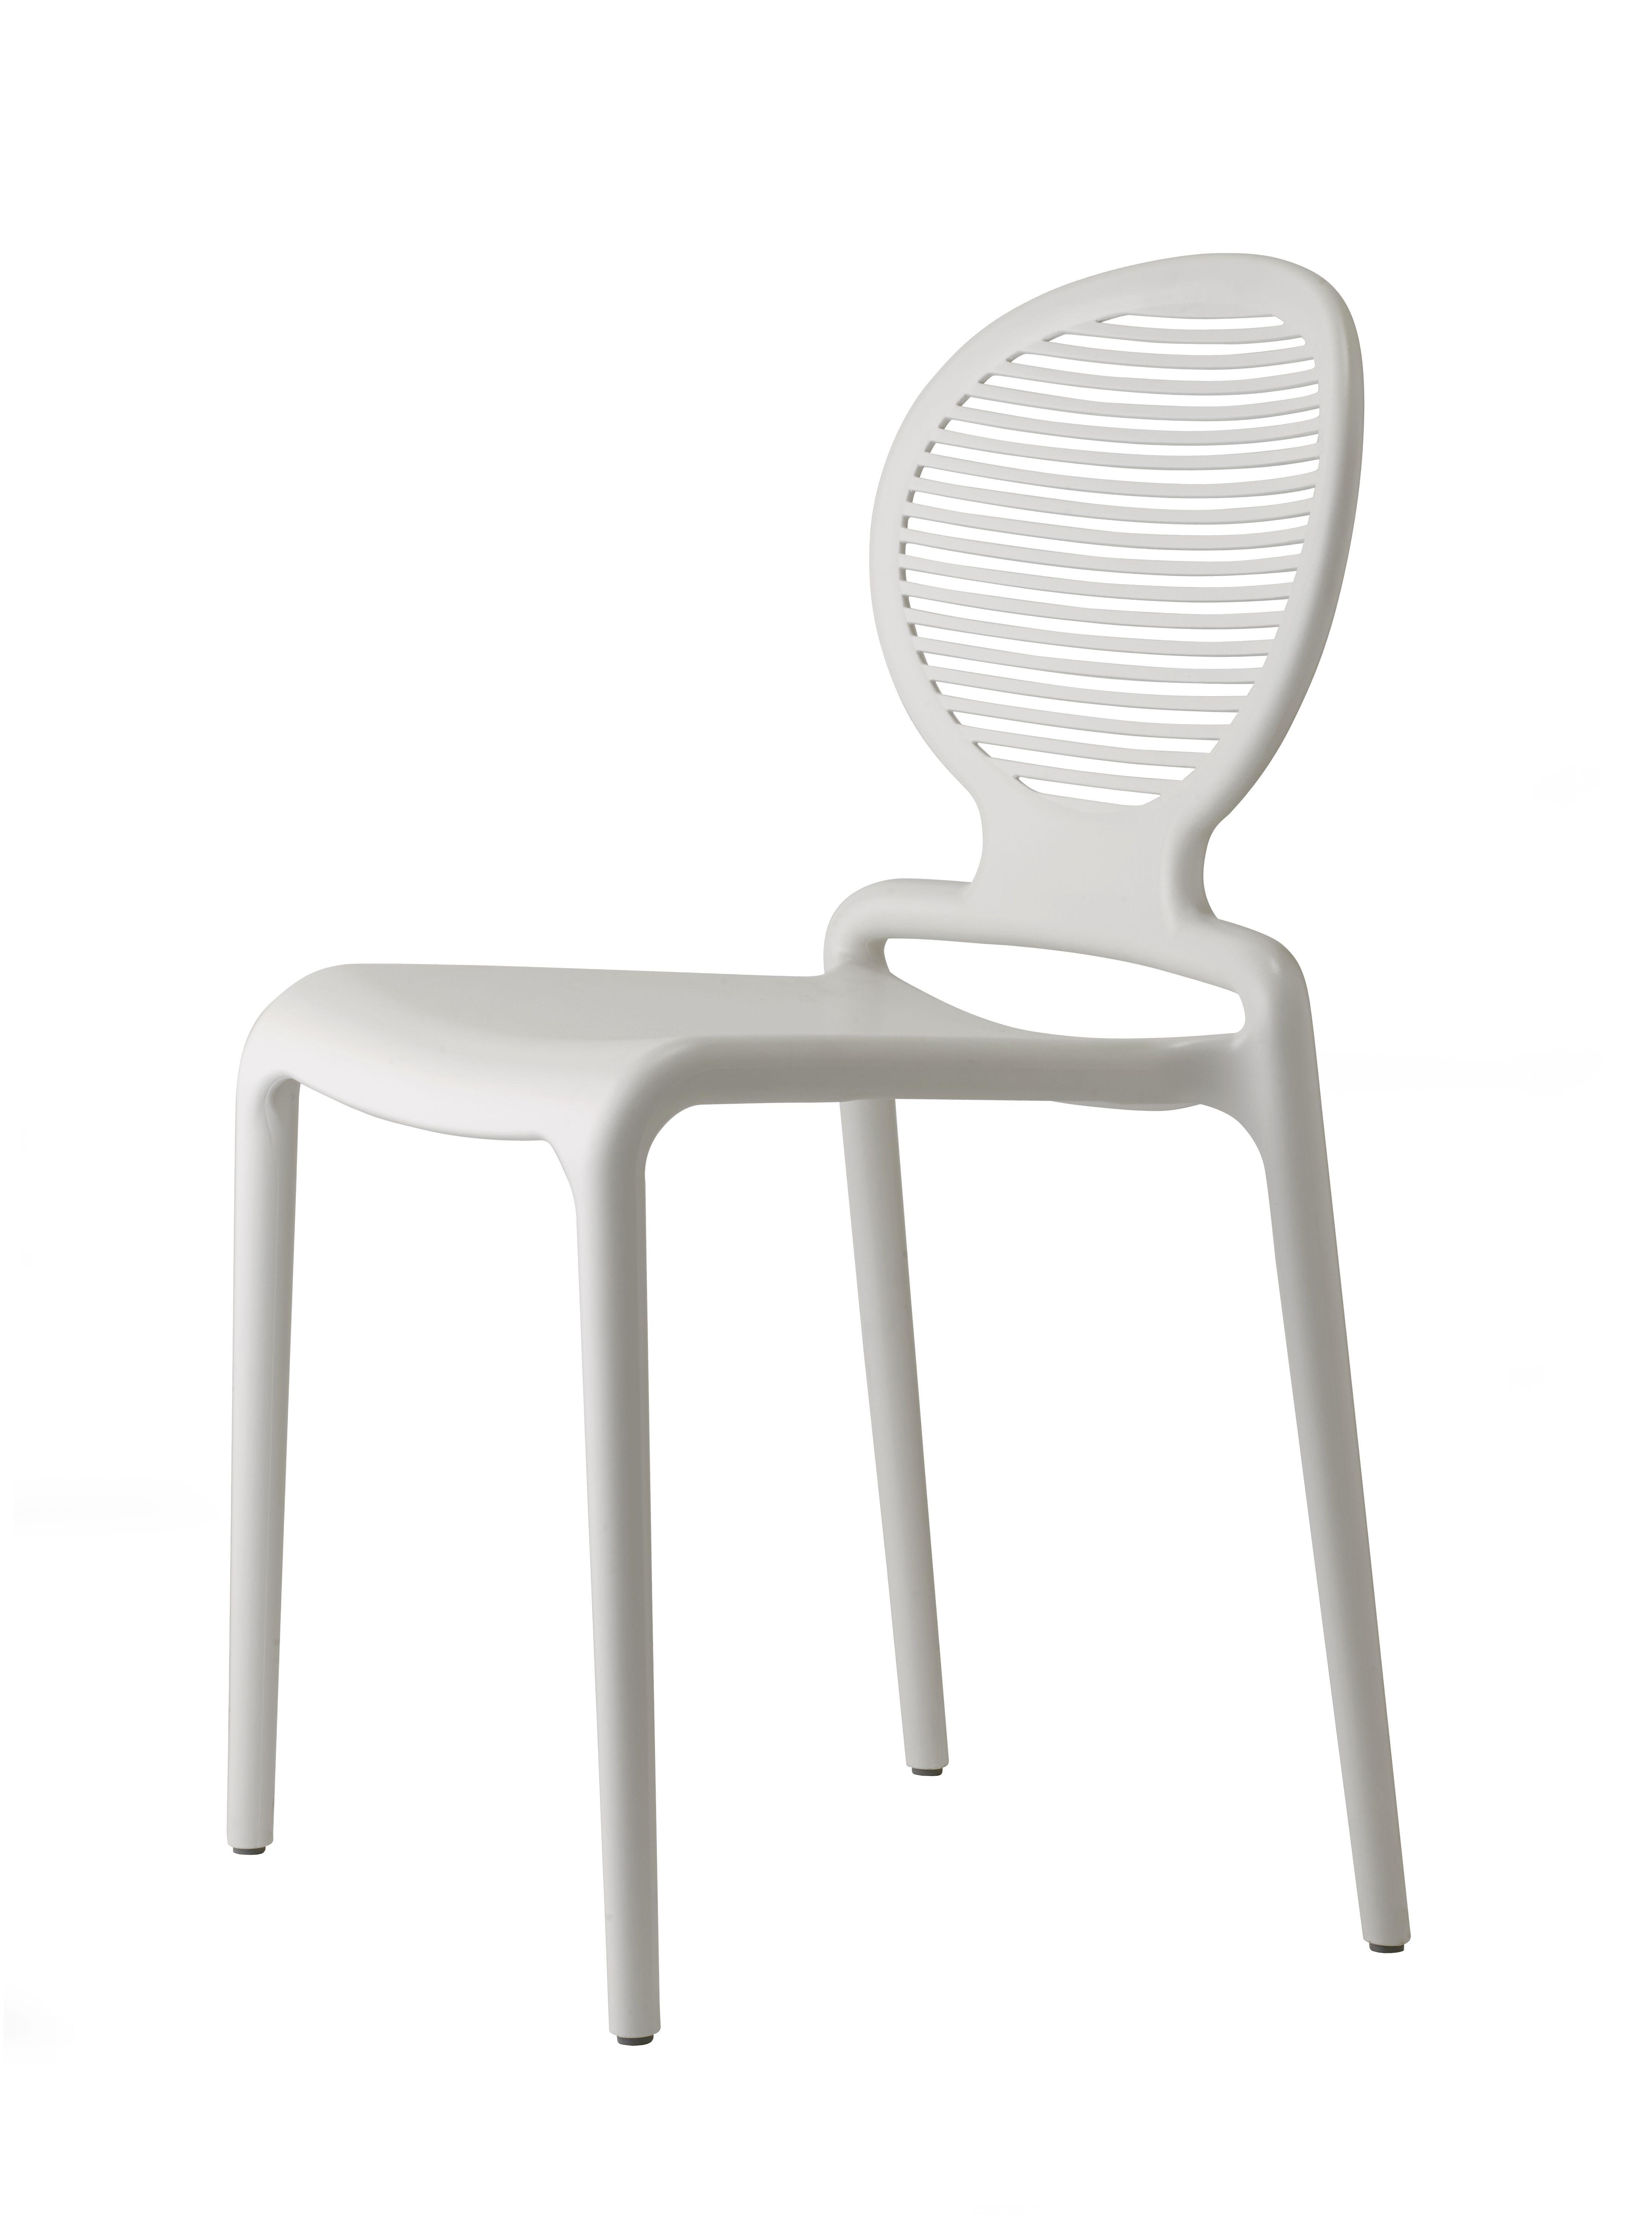 Lavinia By Scab Design Scab Design Chairs Chair Design